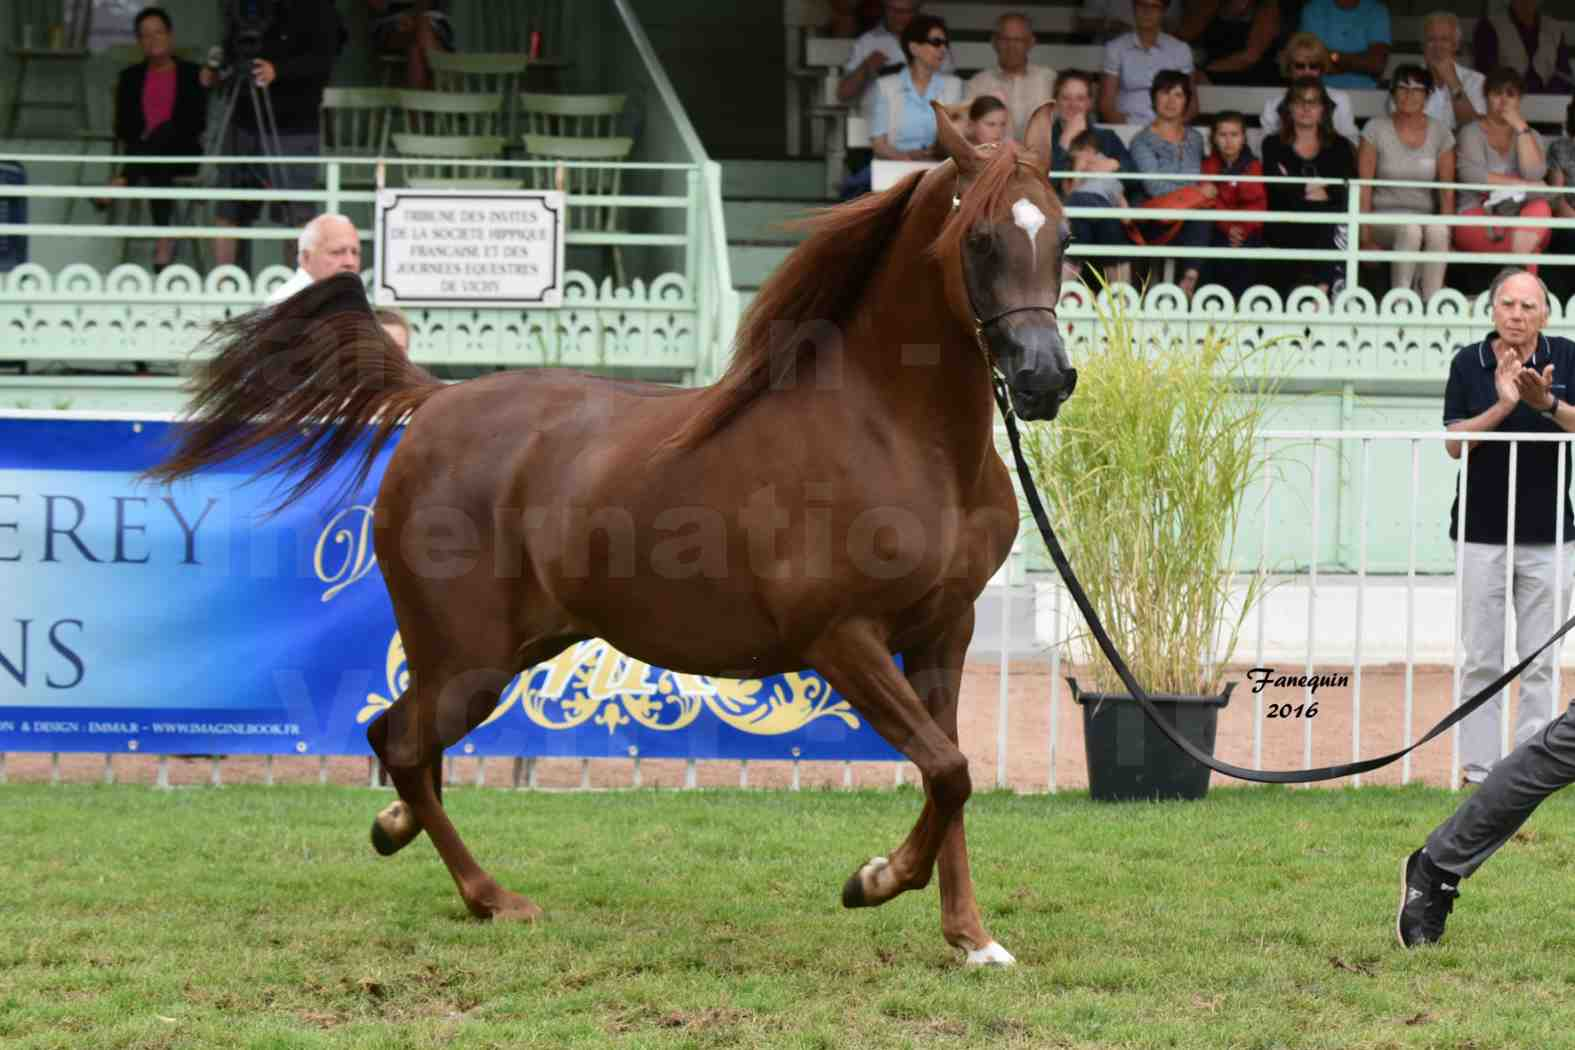 International Arabian Horse Show B de VICHY 2016 - PEARL DE DJOON - Notre Sélection - 11